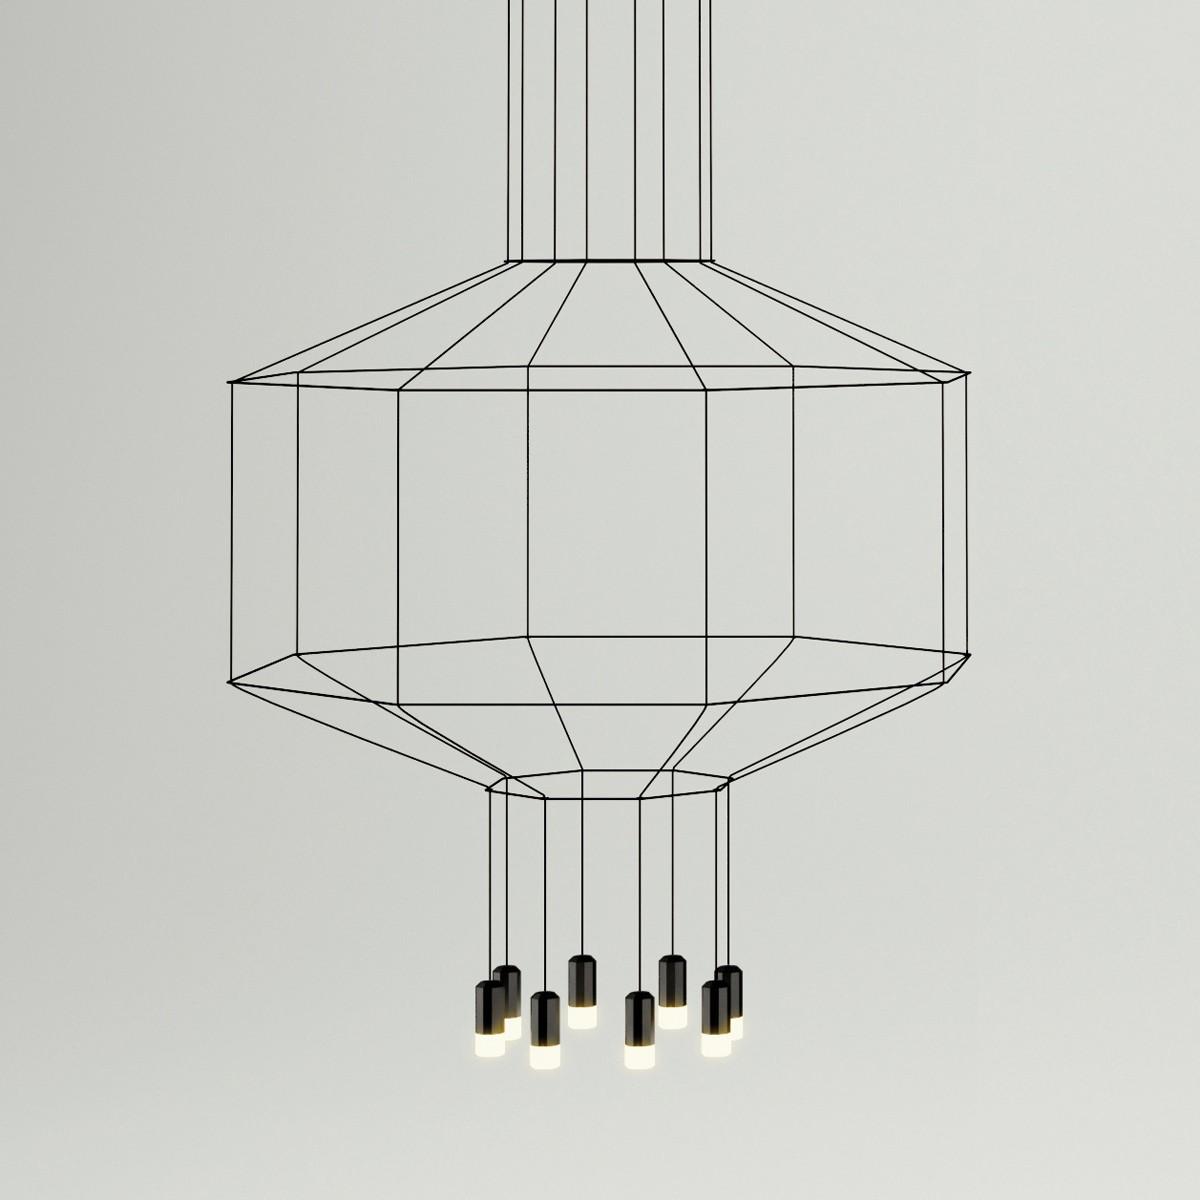 Vibia Wireflow Pendelleuchte, 8-flg., 150 x 150 cm, schwarz